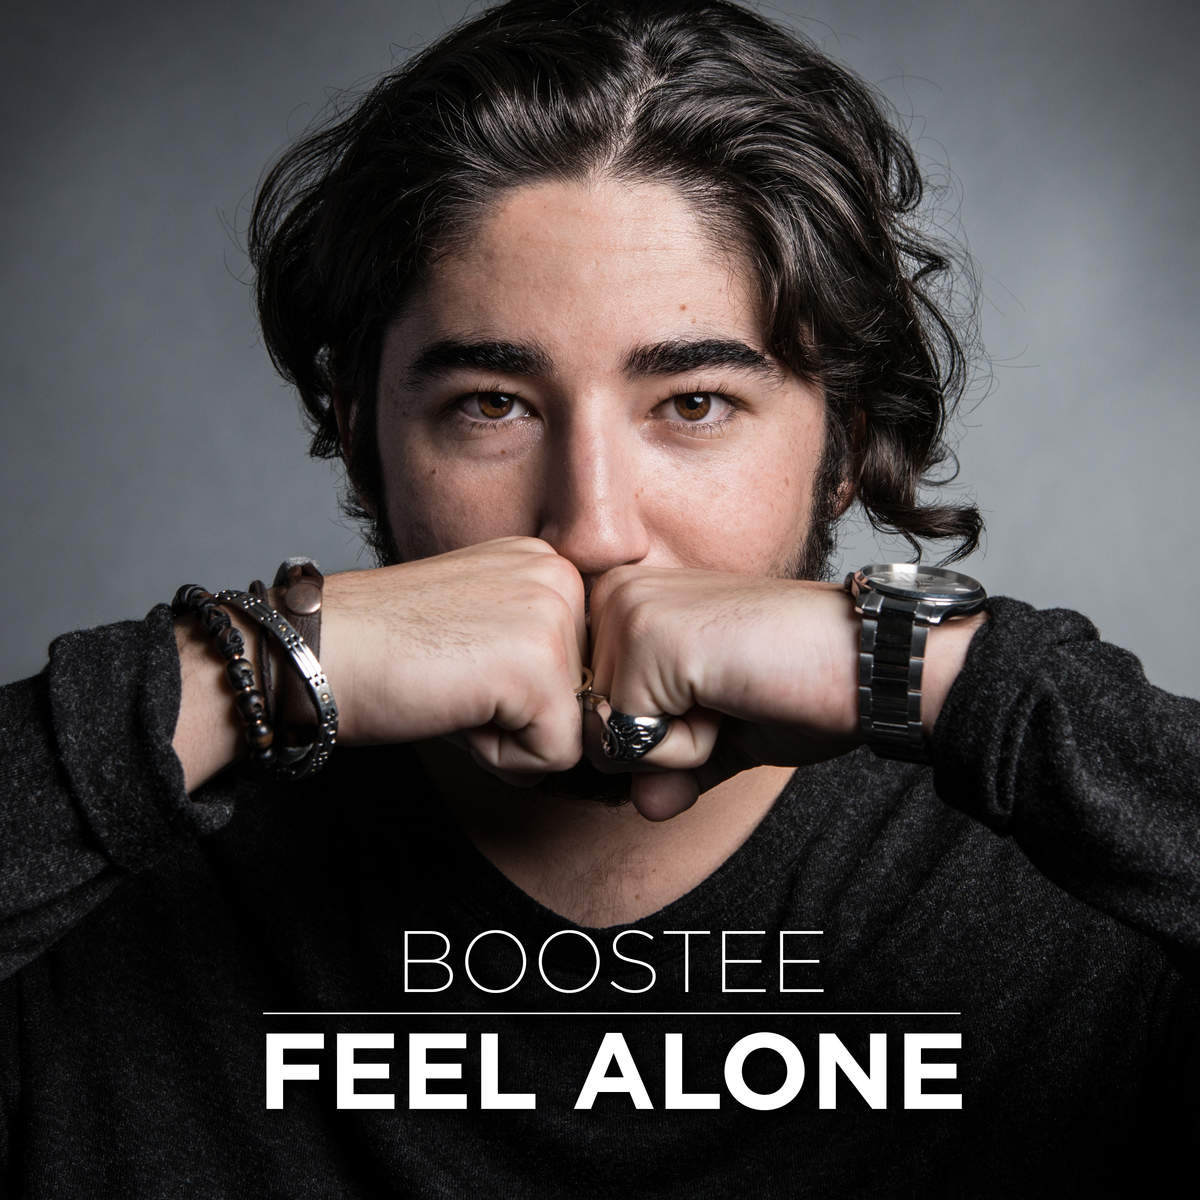 Boostee Feel alone